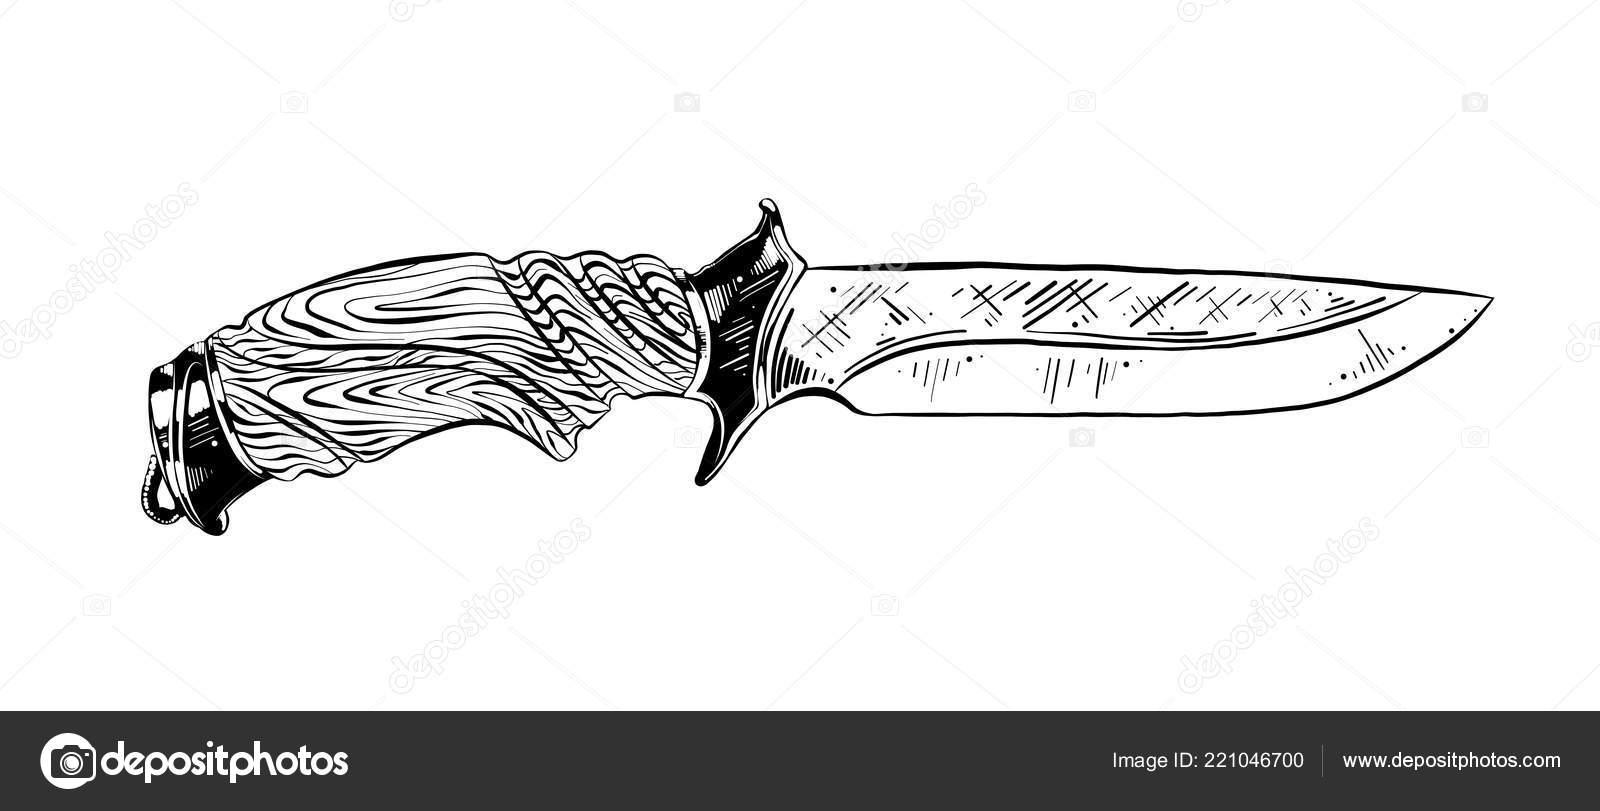 Vektorove Ilustrace Ryte Styl Pro Plakaty Dekorace Tisk Rucne Tazene